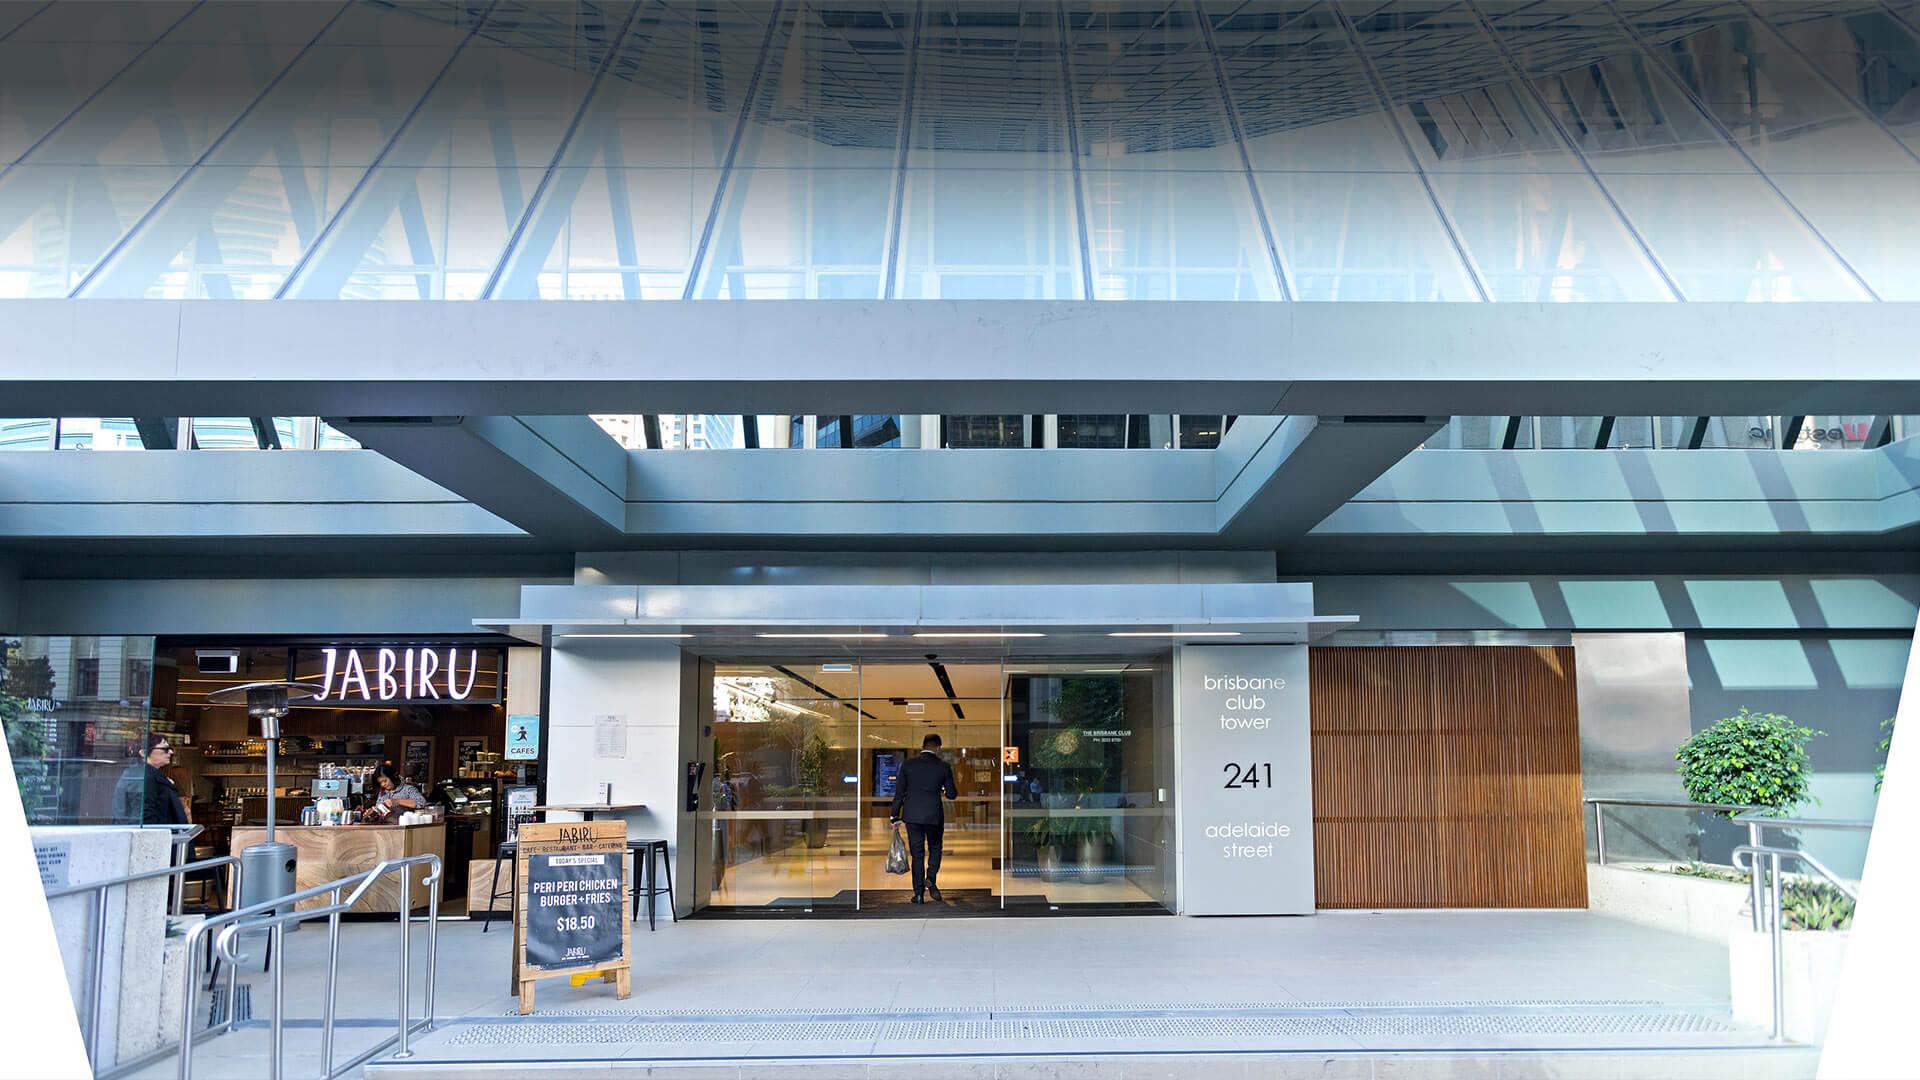 Denticine Pty Ltd, Dr Mark Tuffley Post Office Square, Brisbane, consulting for wisdom teeth, Implants